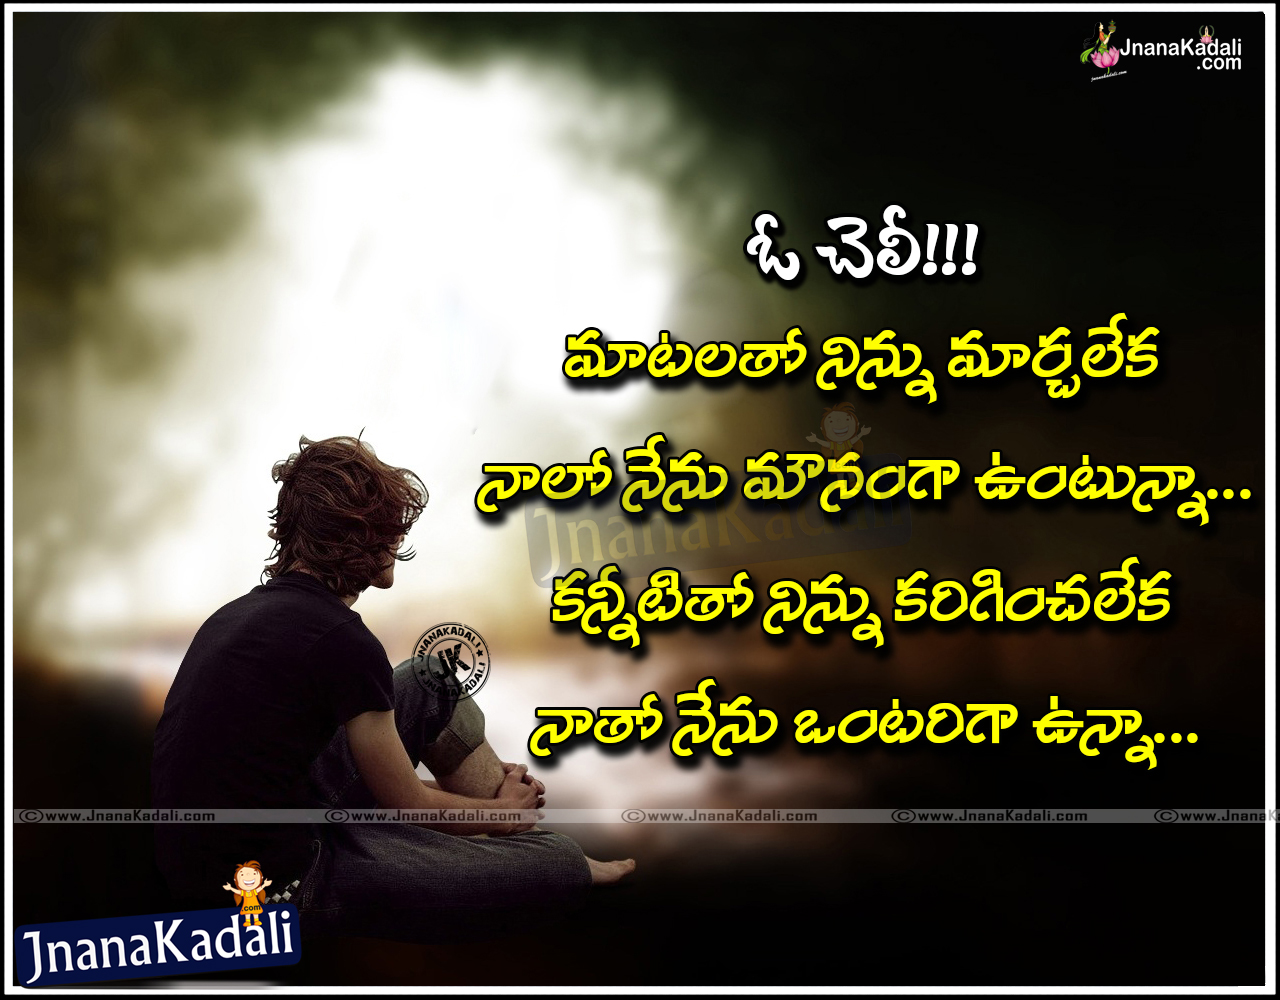 Inspirational Sad Quotes Images In Telugu Soaknowledge